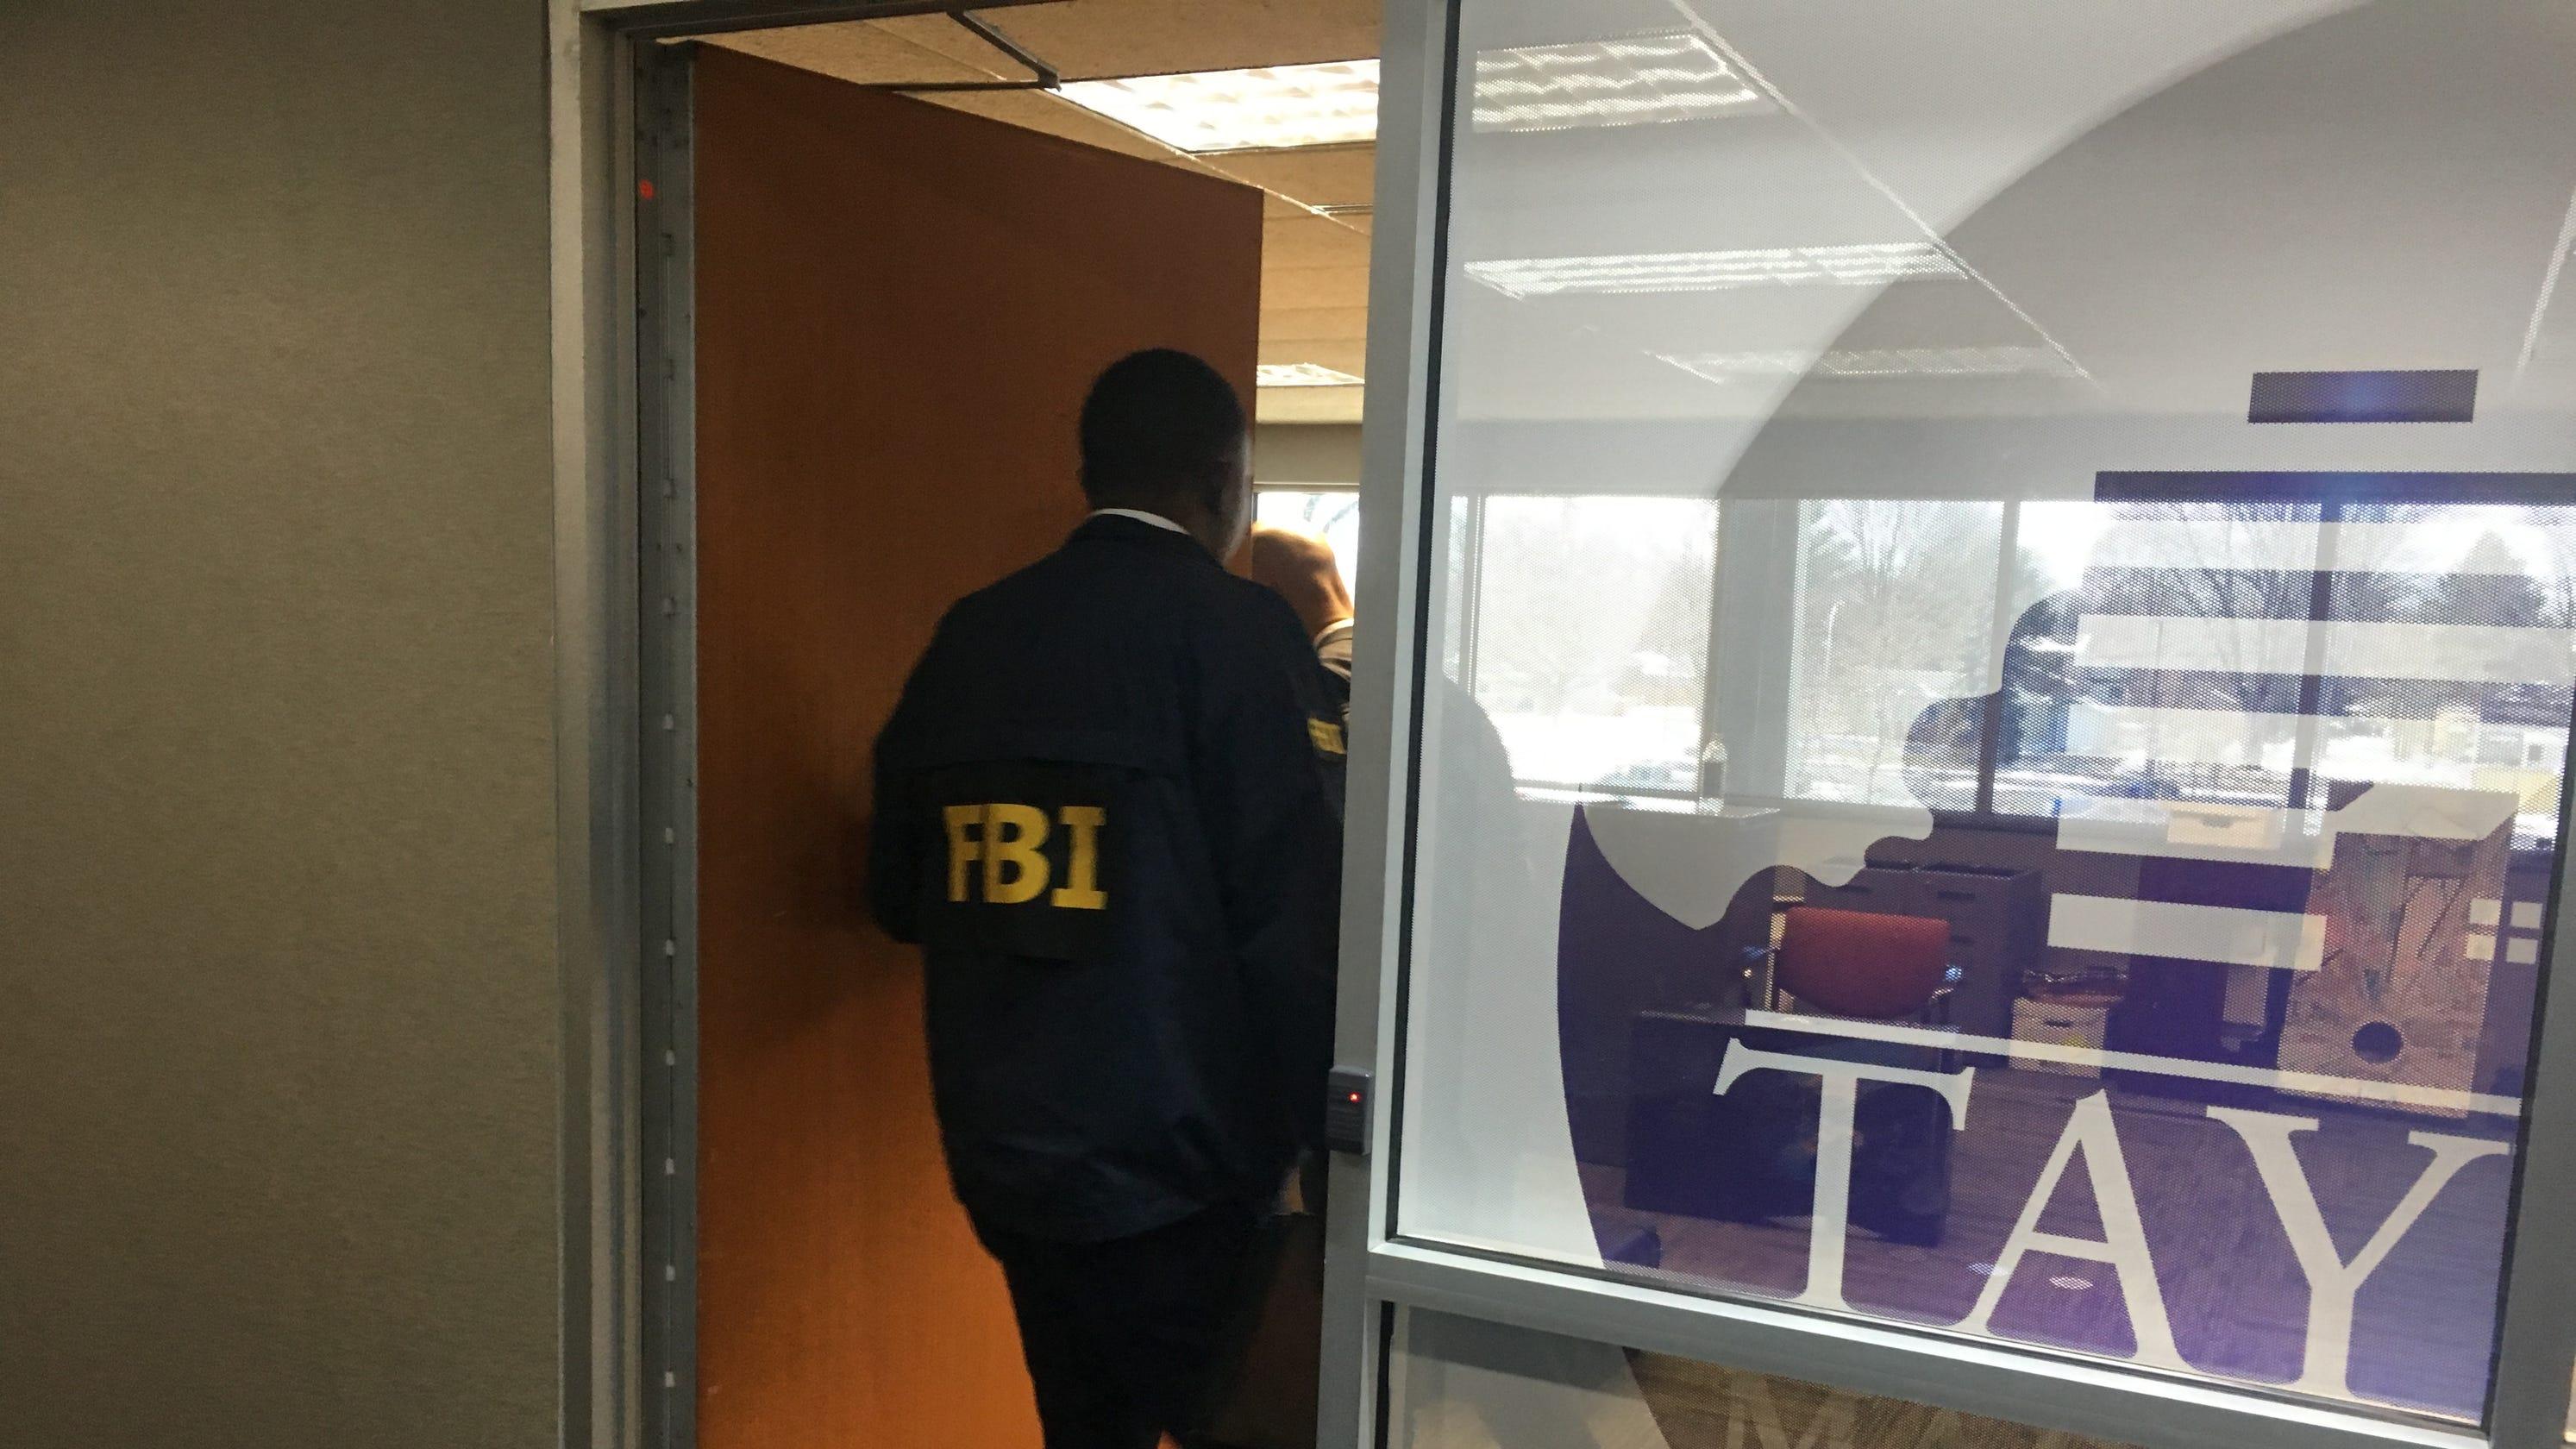 Taylor Corruption Investigation Widens With New FBI Raids